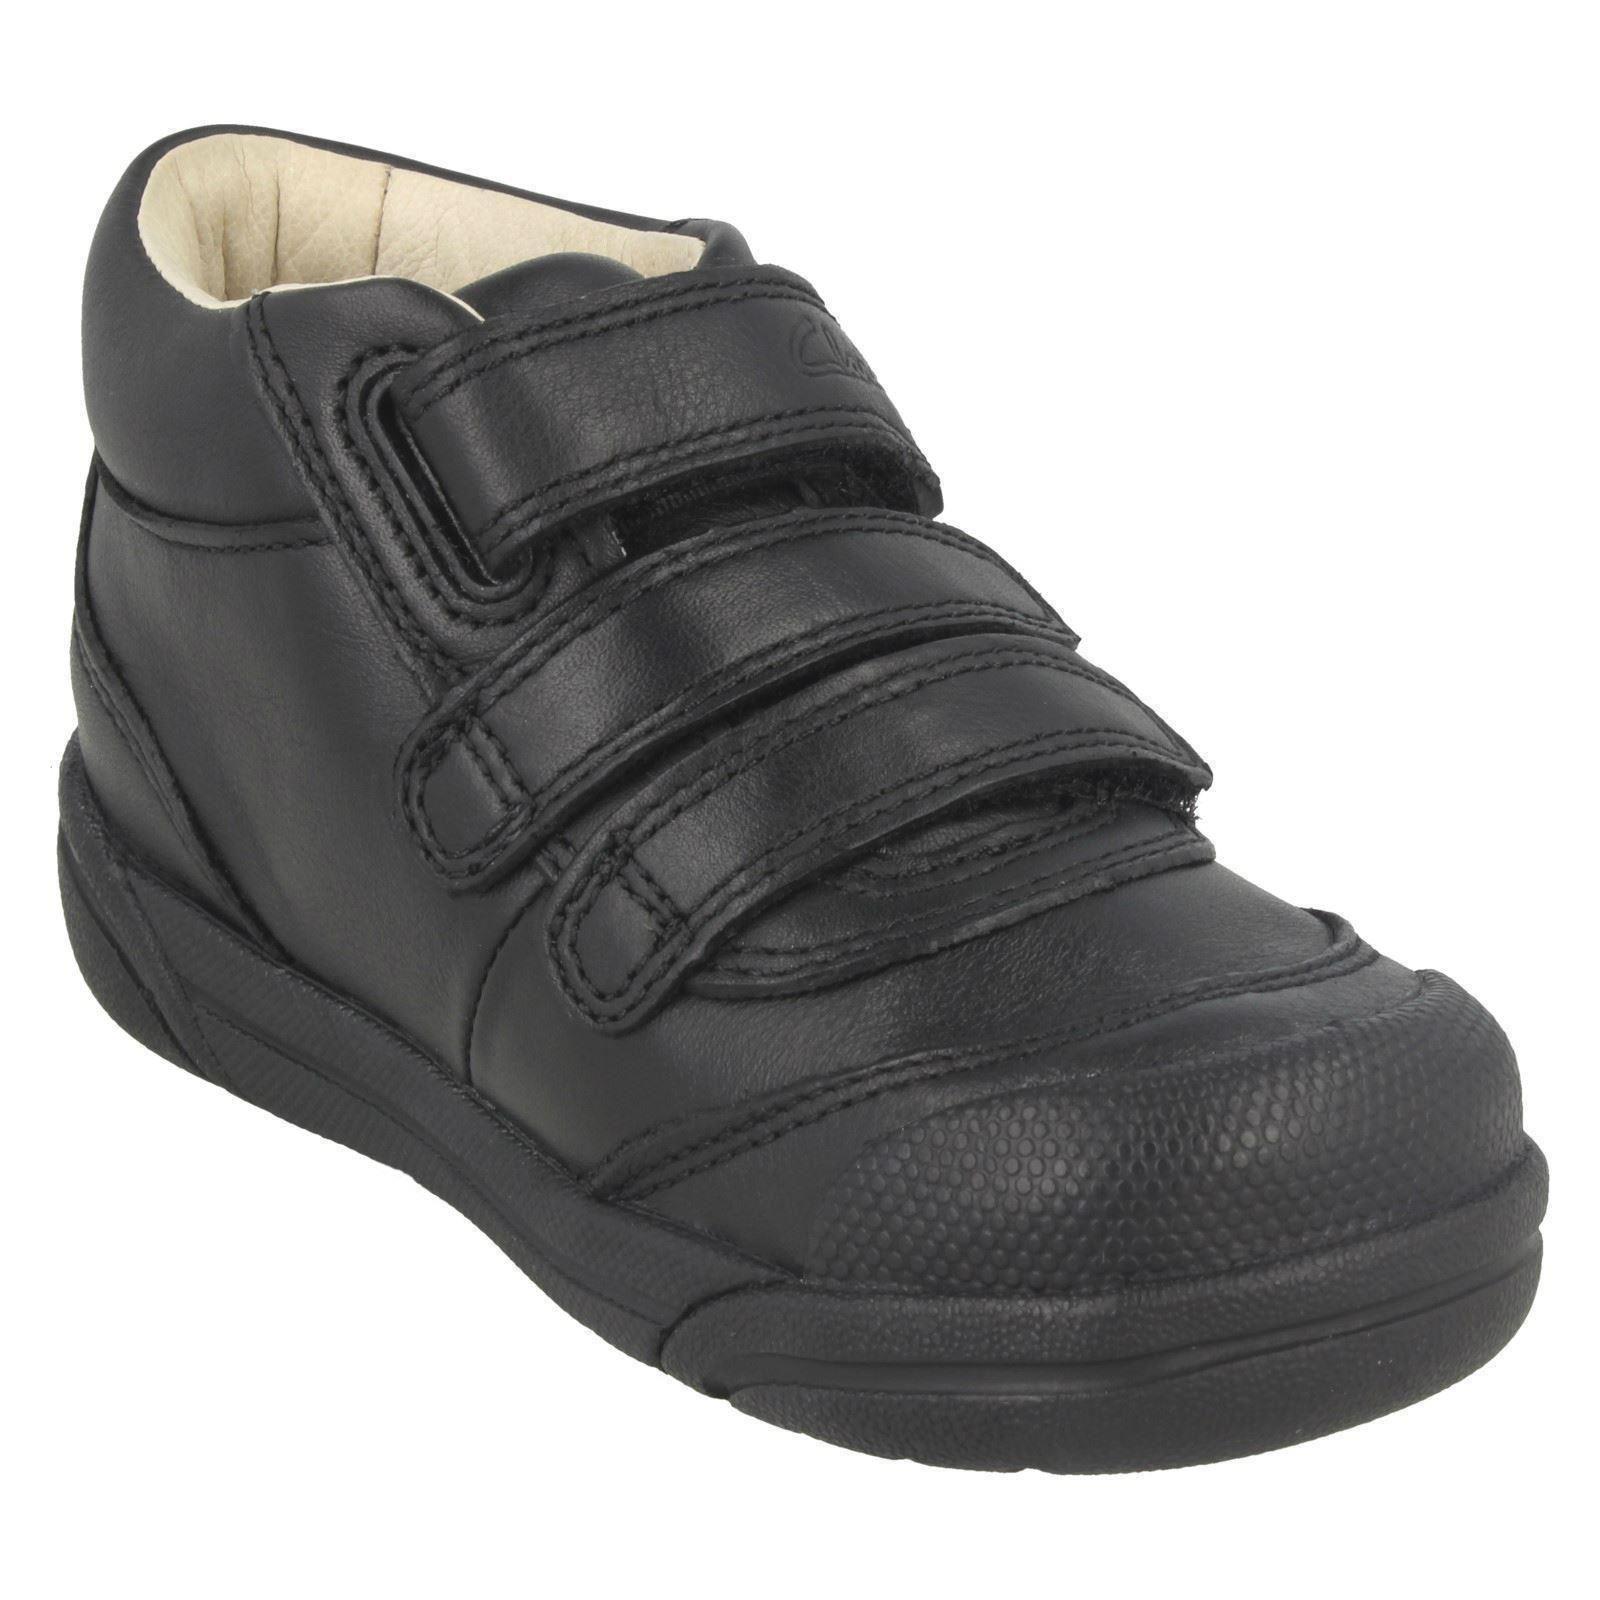 Boys Clarks Ankle Boots Lil Folk Jax